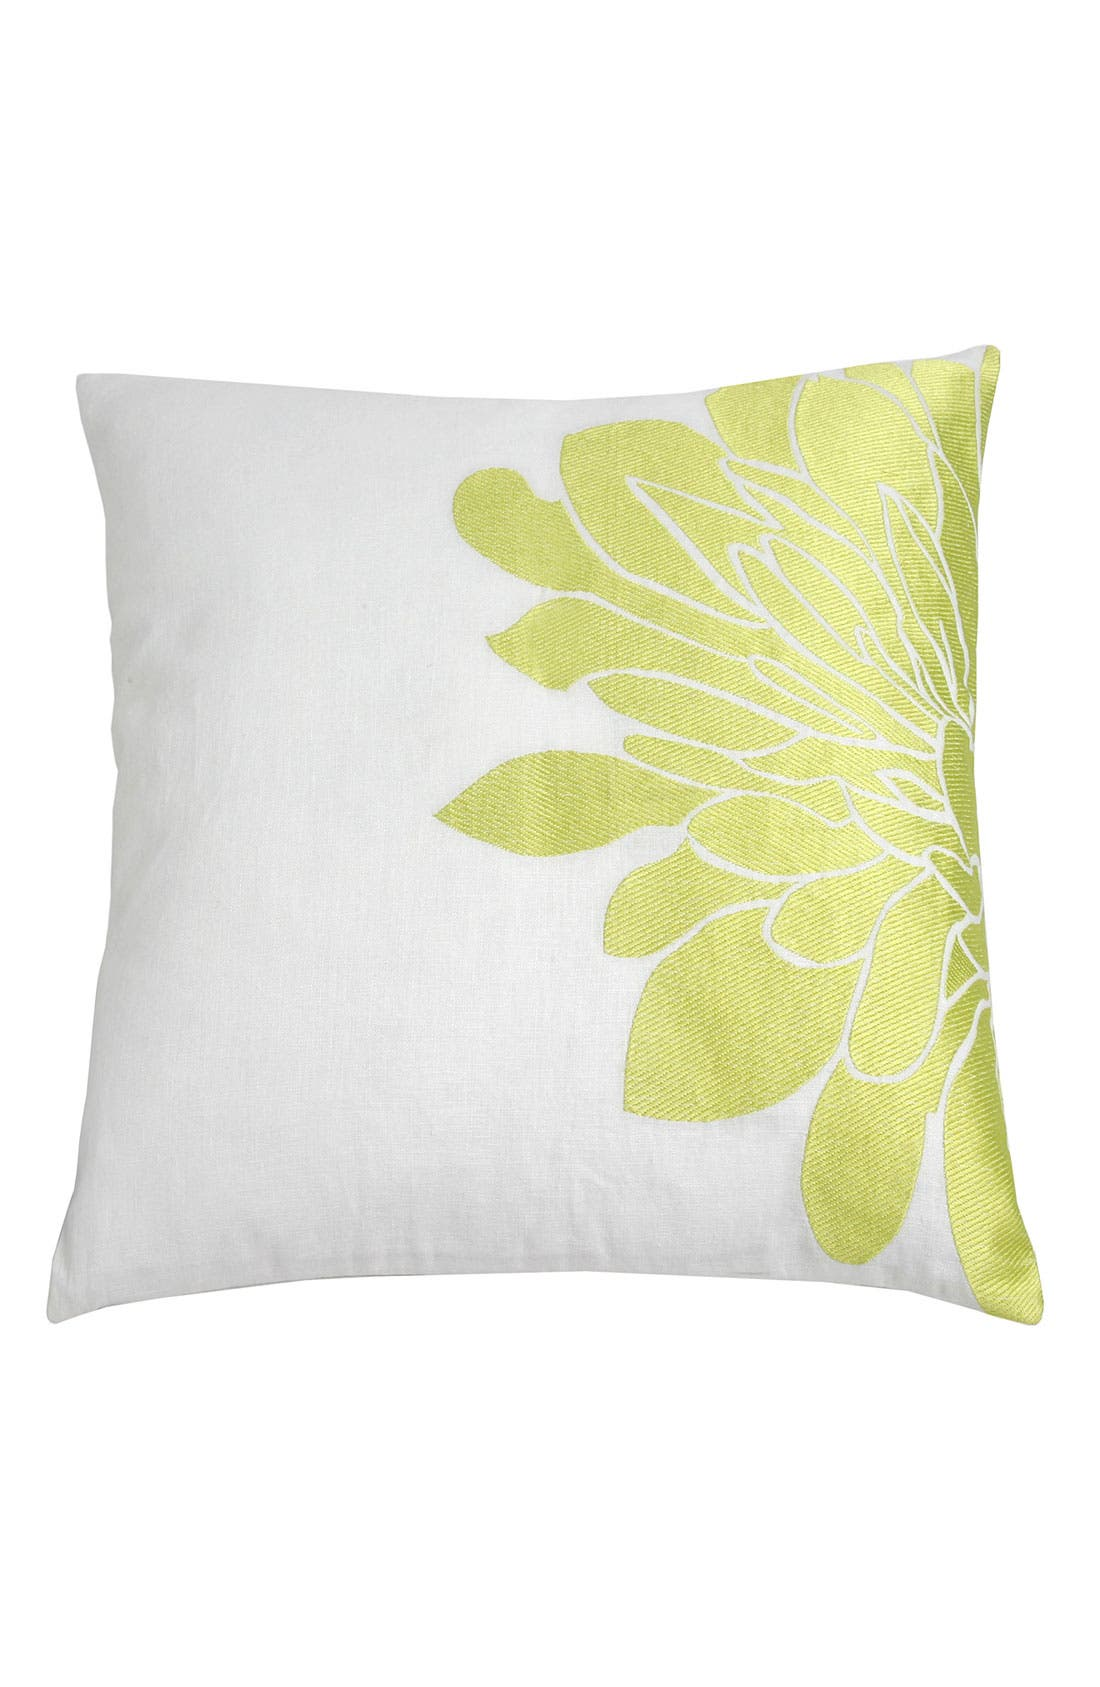 Alternate Image 1 Selected - Blissliving Home 'Gemini Citron' Pillow (Online Only)